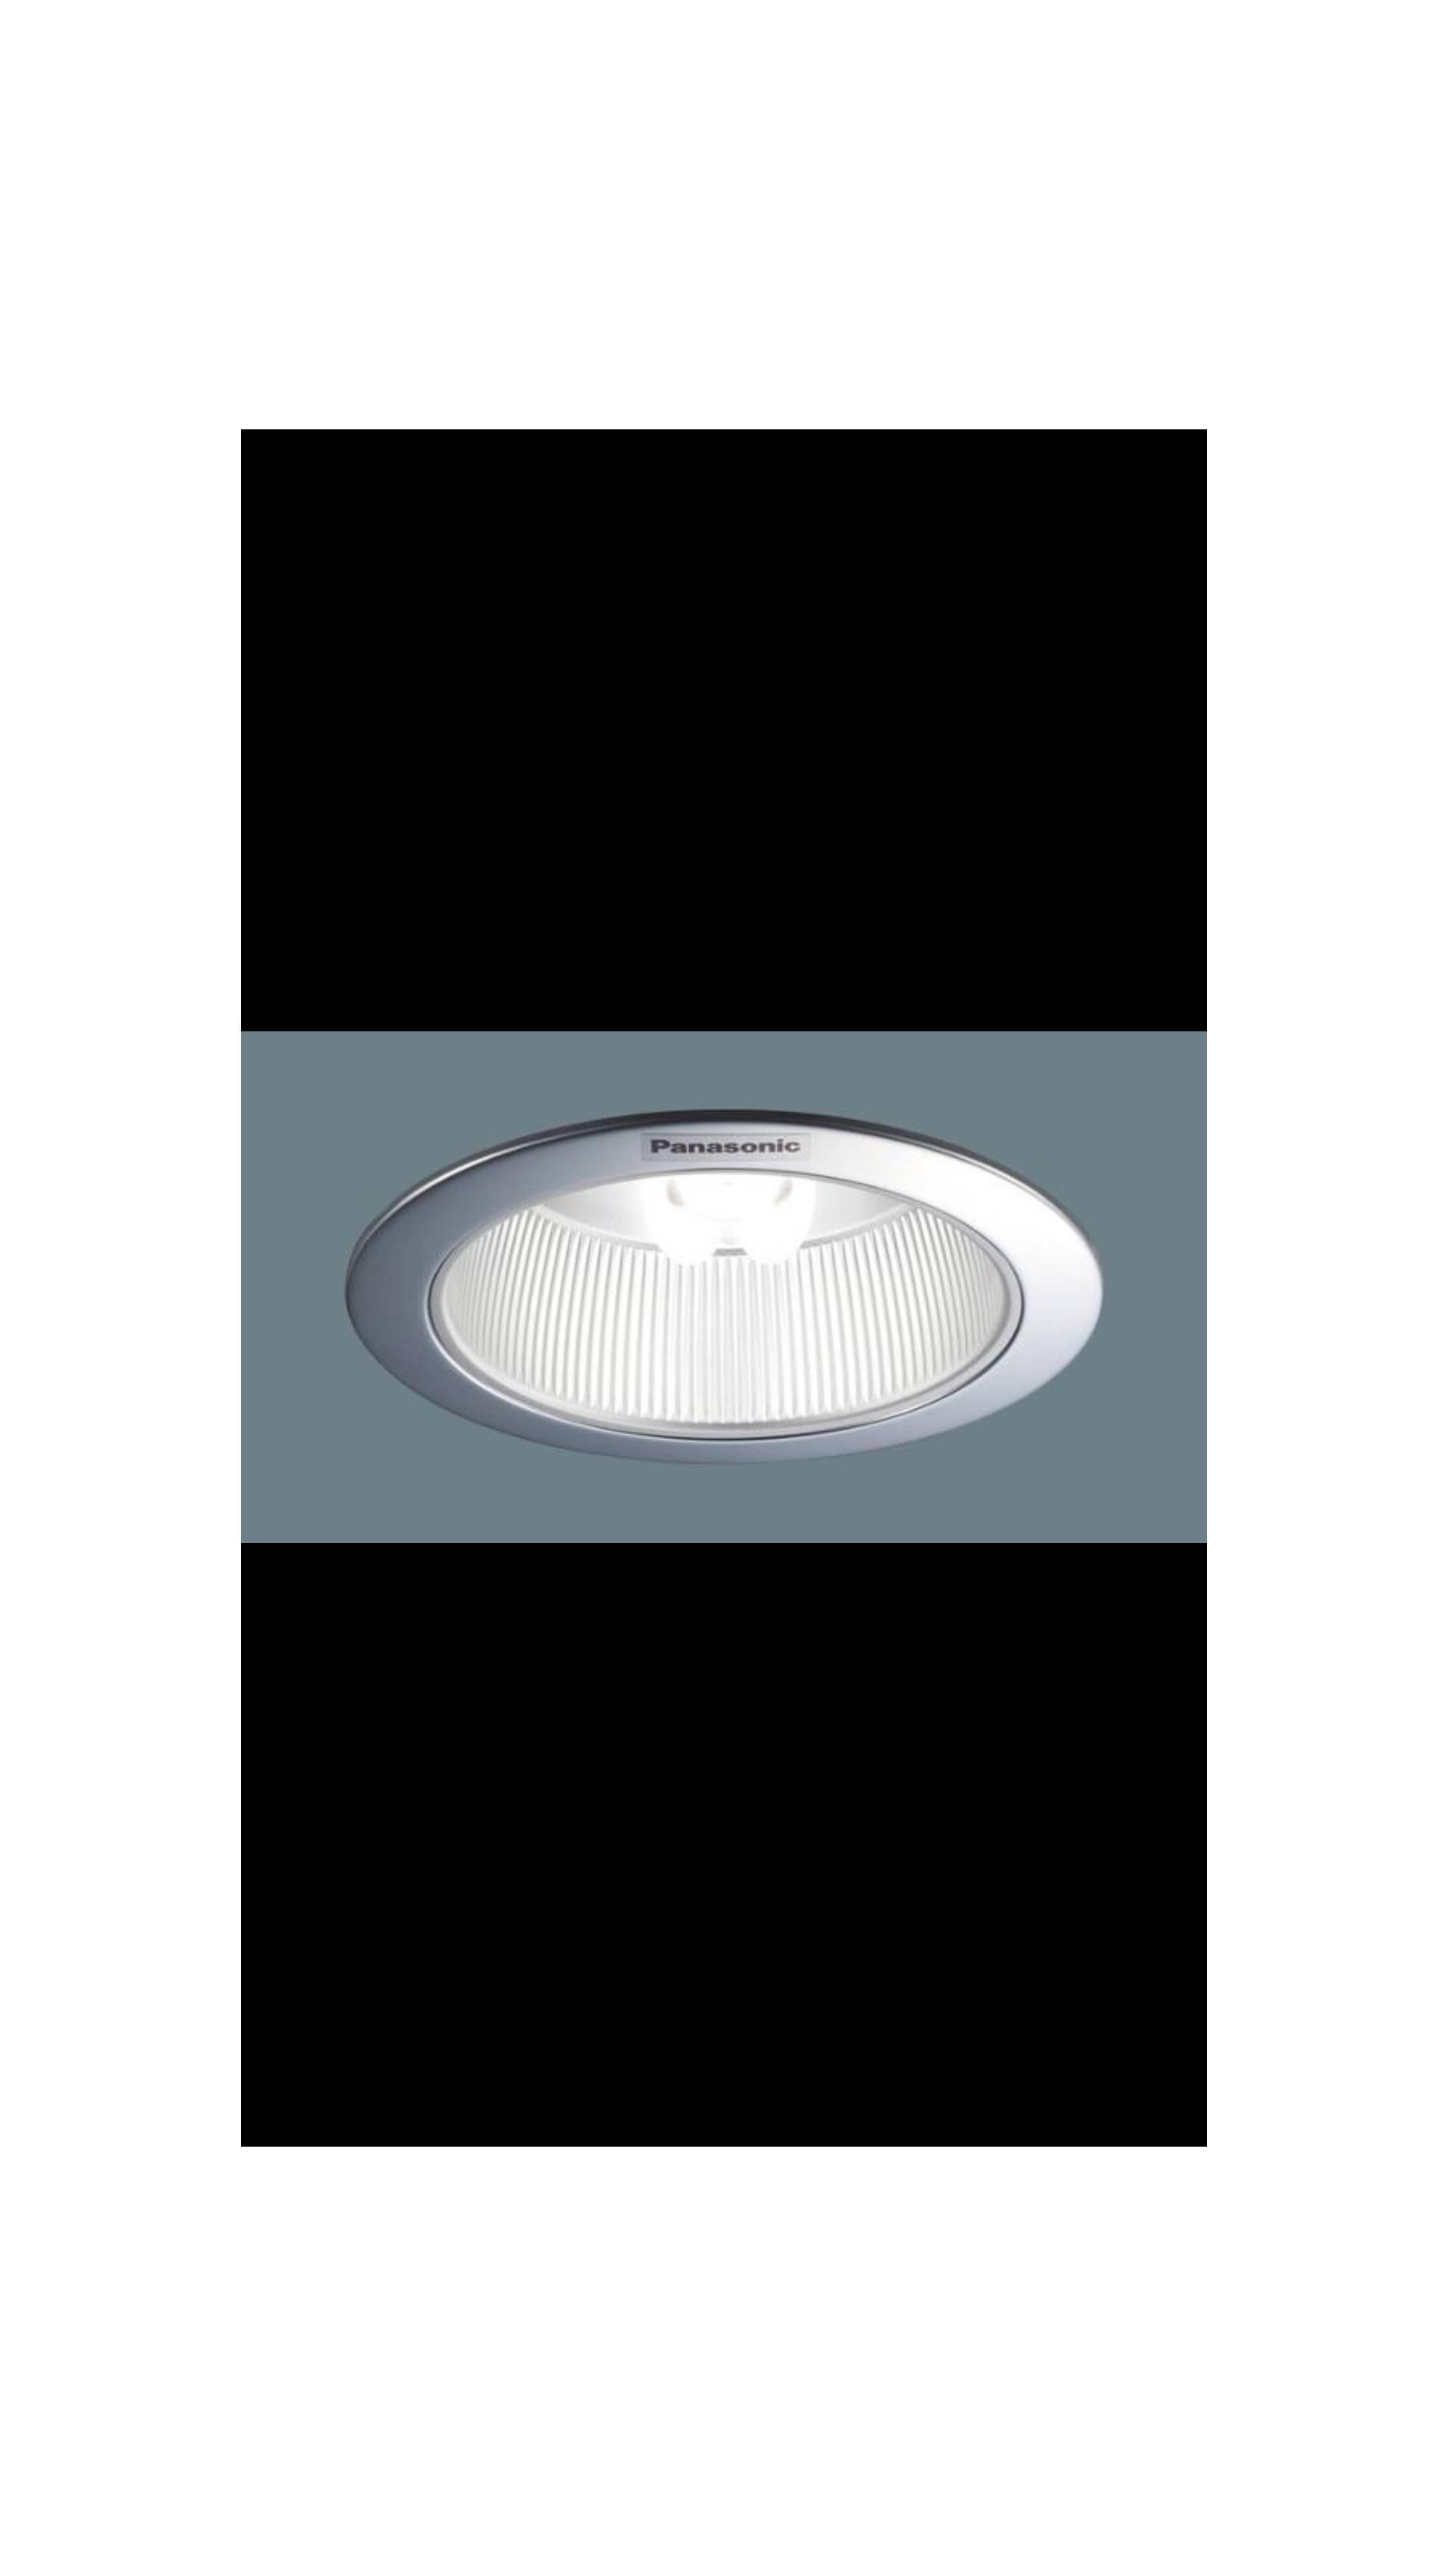 "Downlight panasonic 4in 4"" frame silver reflektor buffle nnp 72333"